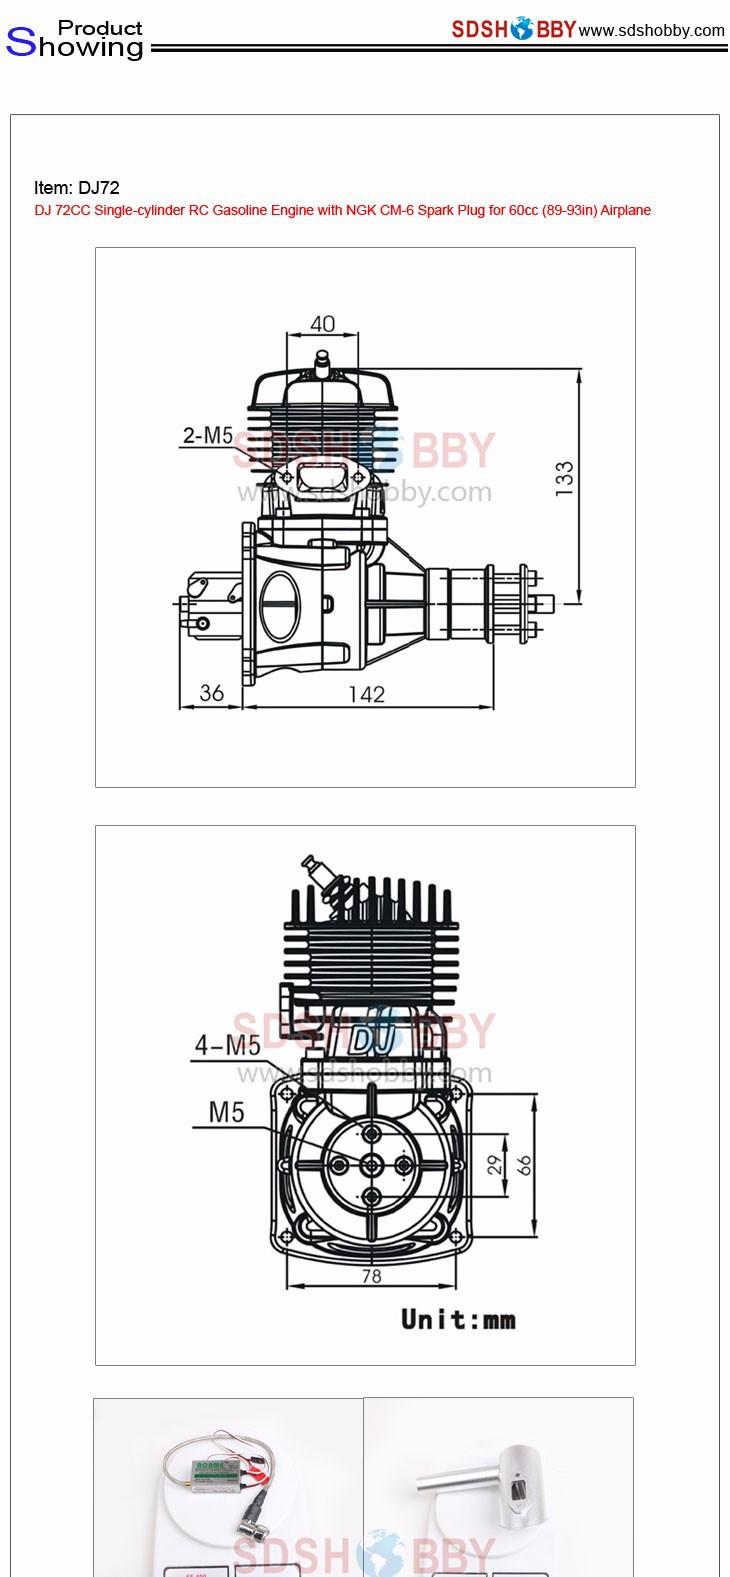 Dj 72cc Single Cylinder Rc Gasoline Engine With Ngk Cm 6